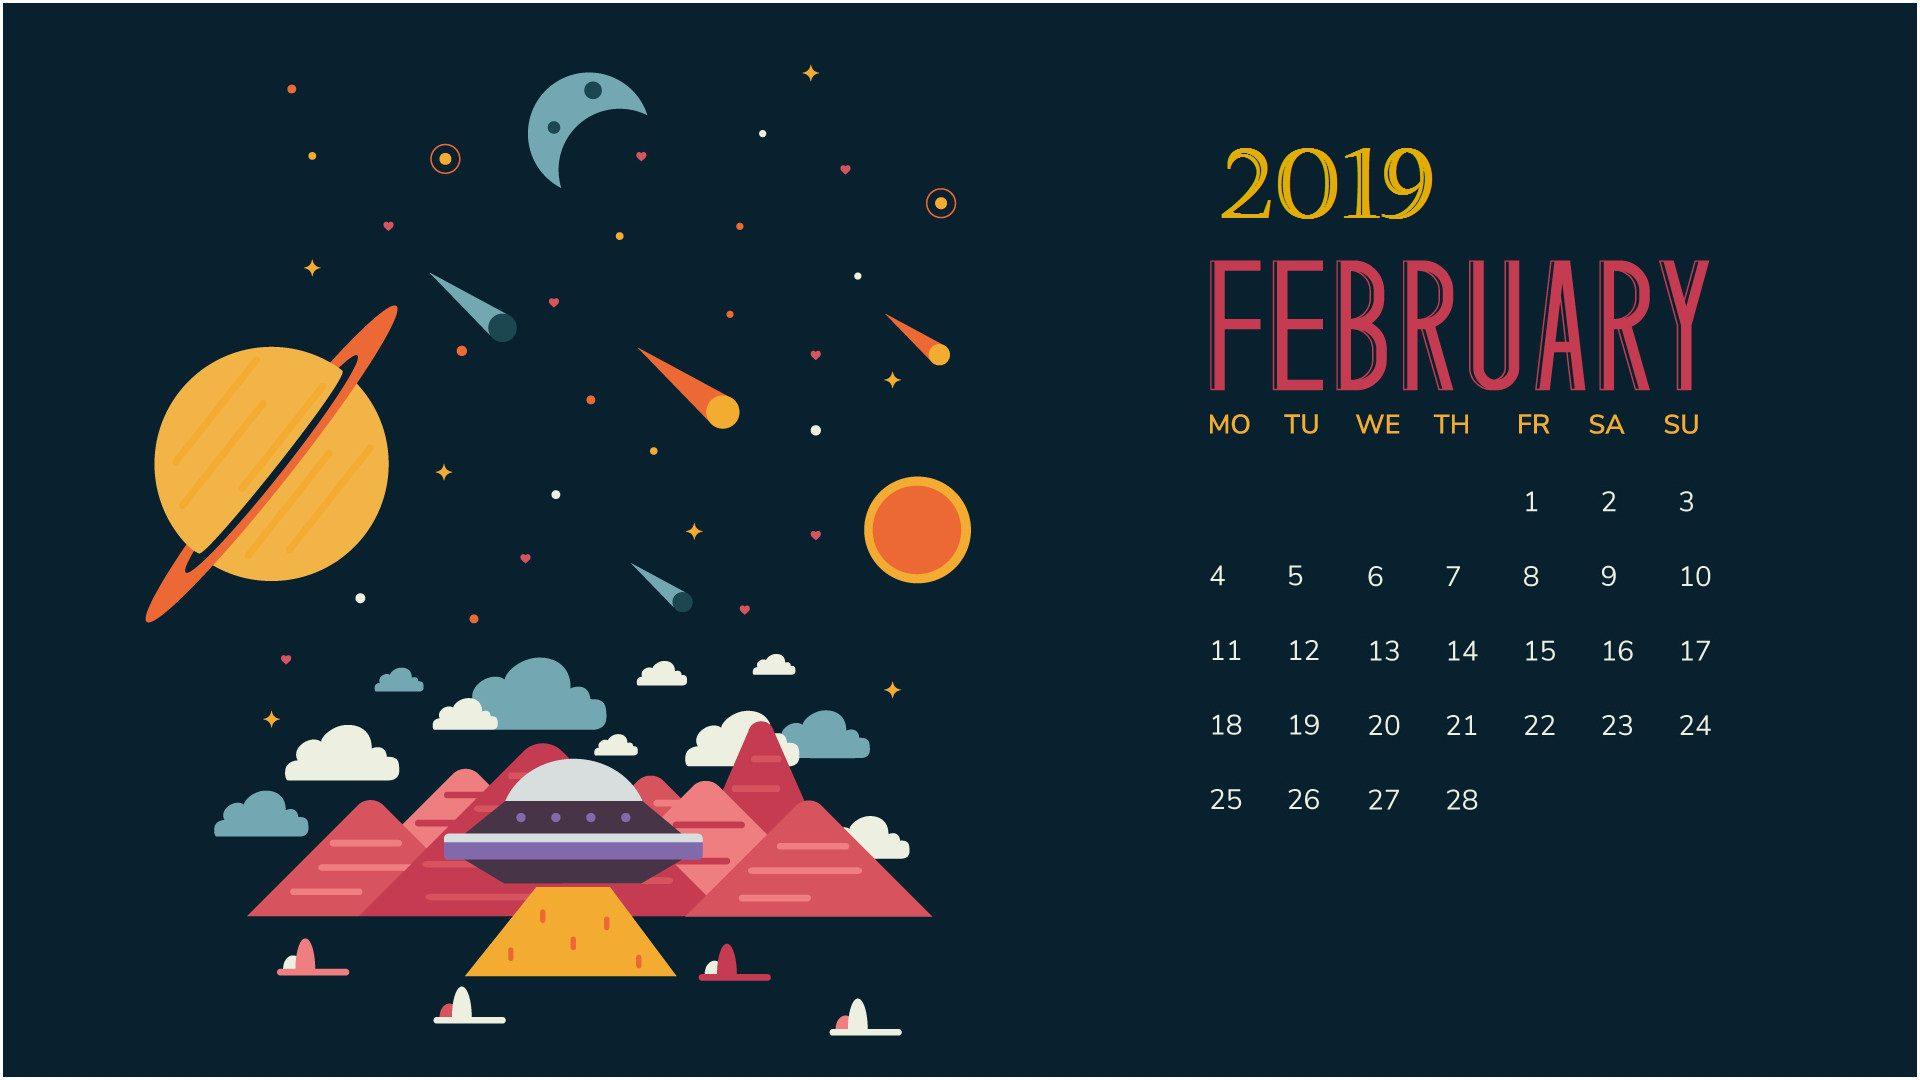 February 2019 Desktop Calendar